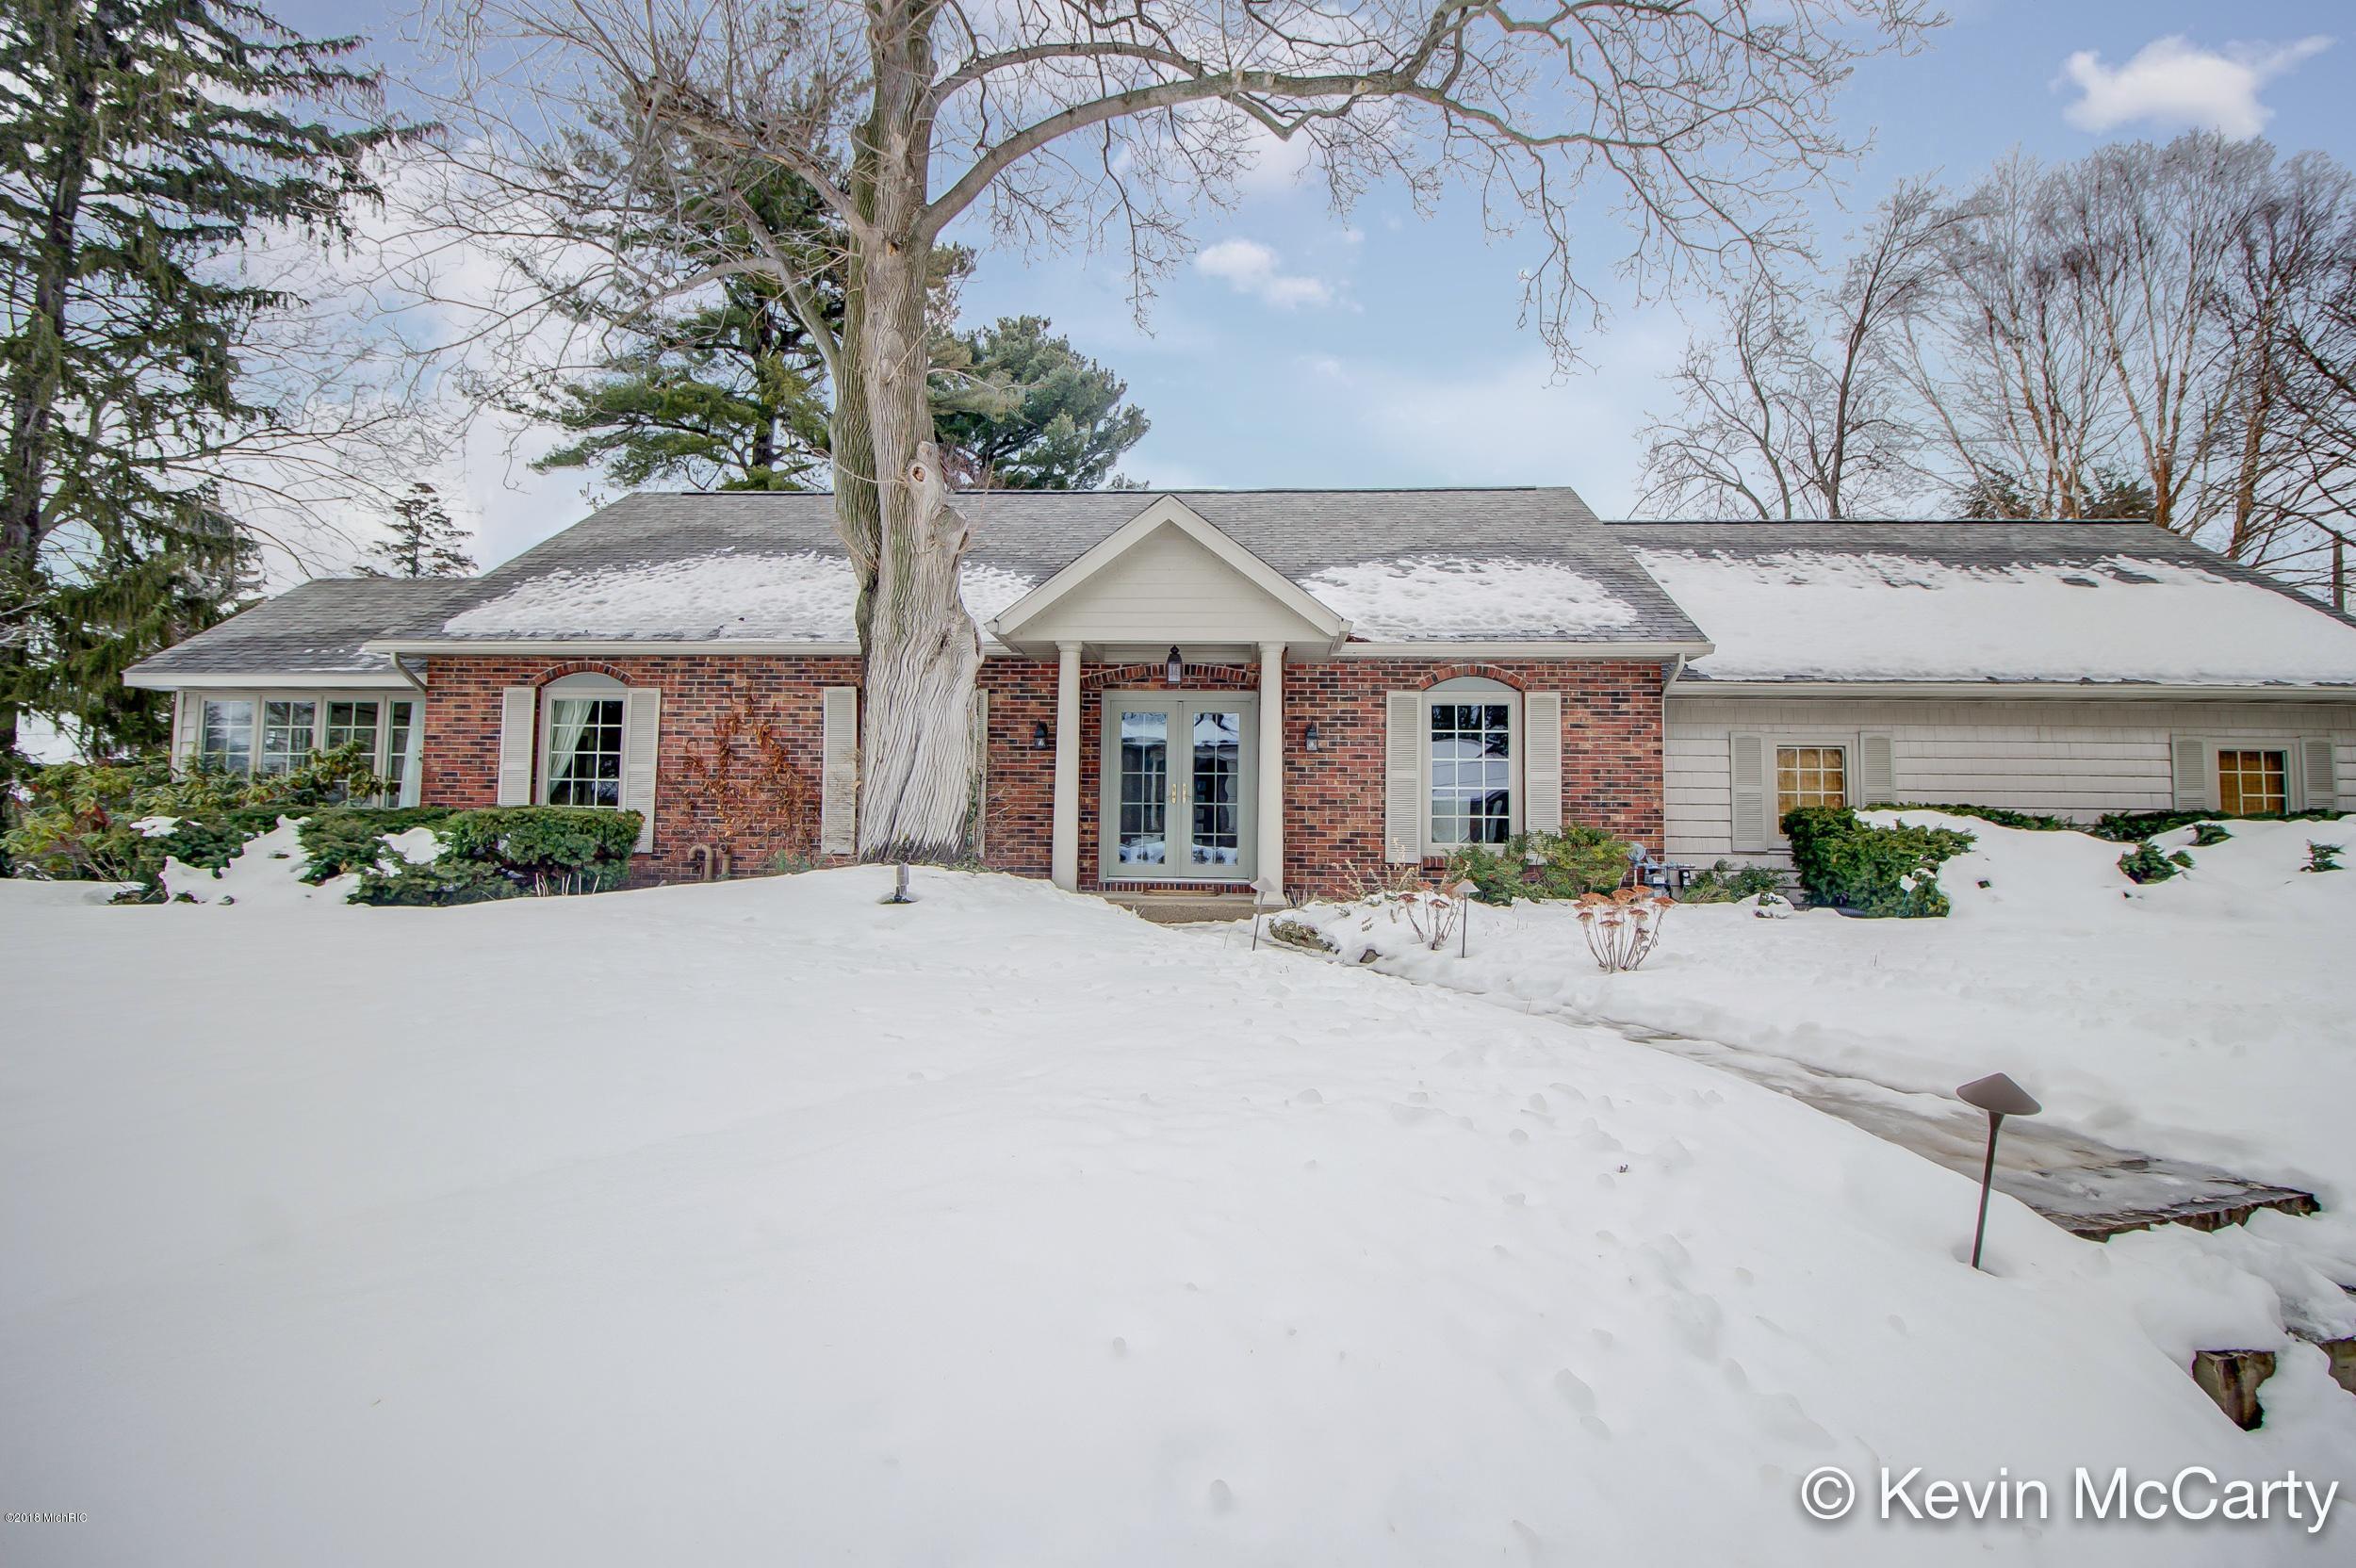 Single Family Home for Sale at 457 Brecado 457 Brecado Holland, Michigan 49423 United States